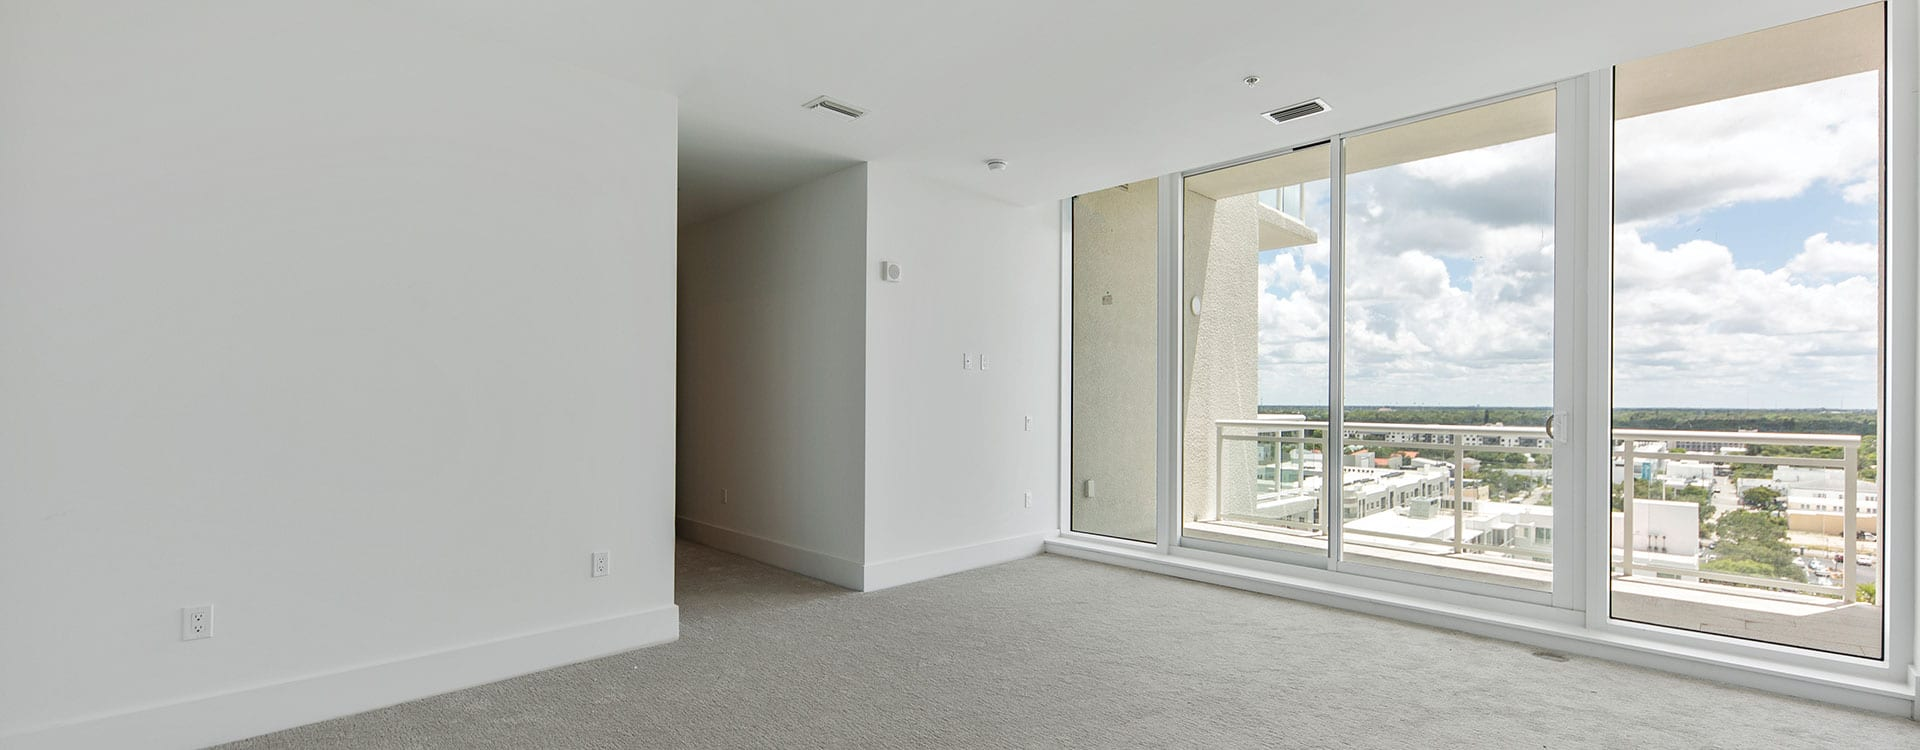 BLVD Sarasota Residence 1102 Bedroom with a view of downtown sarasota